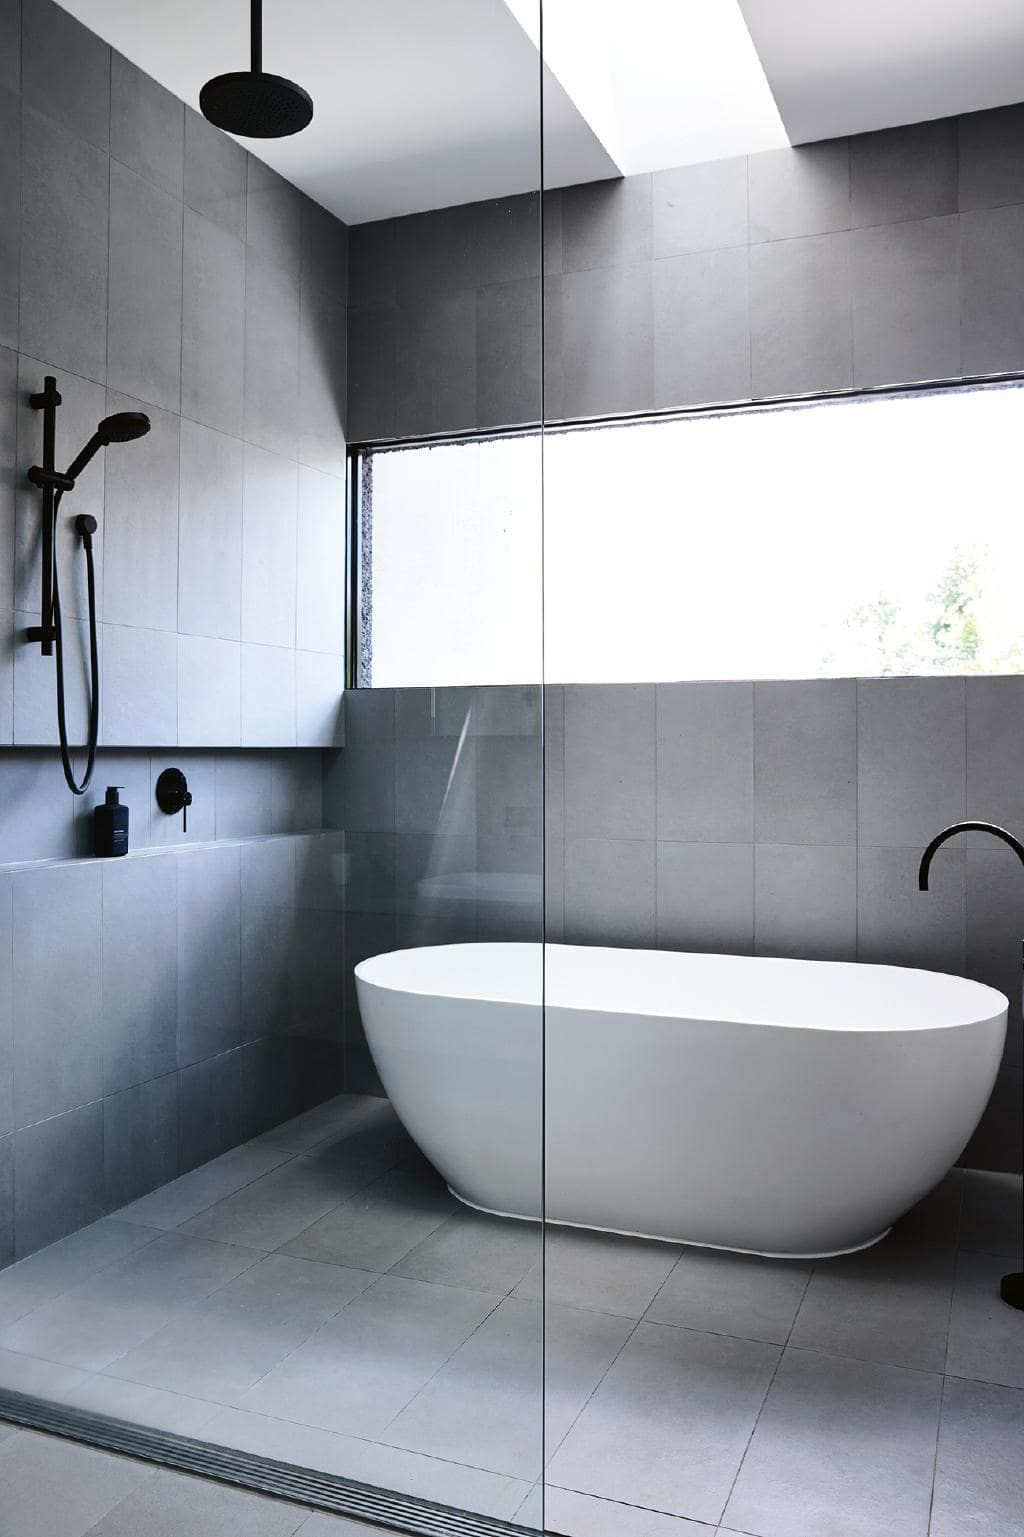 Ensuite Shower Bath Layout With Shelf Detail Yass Bathroom Design Bathroom Interior Design Modern Bathroom